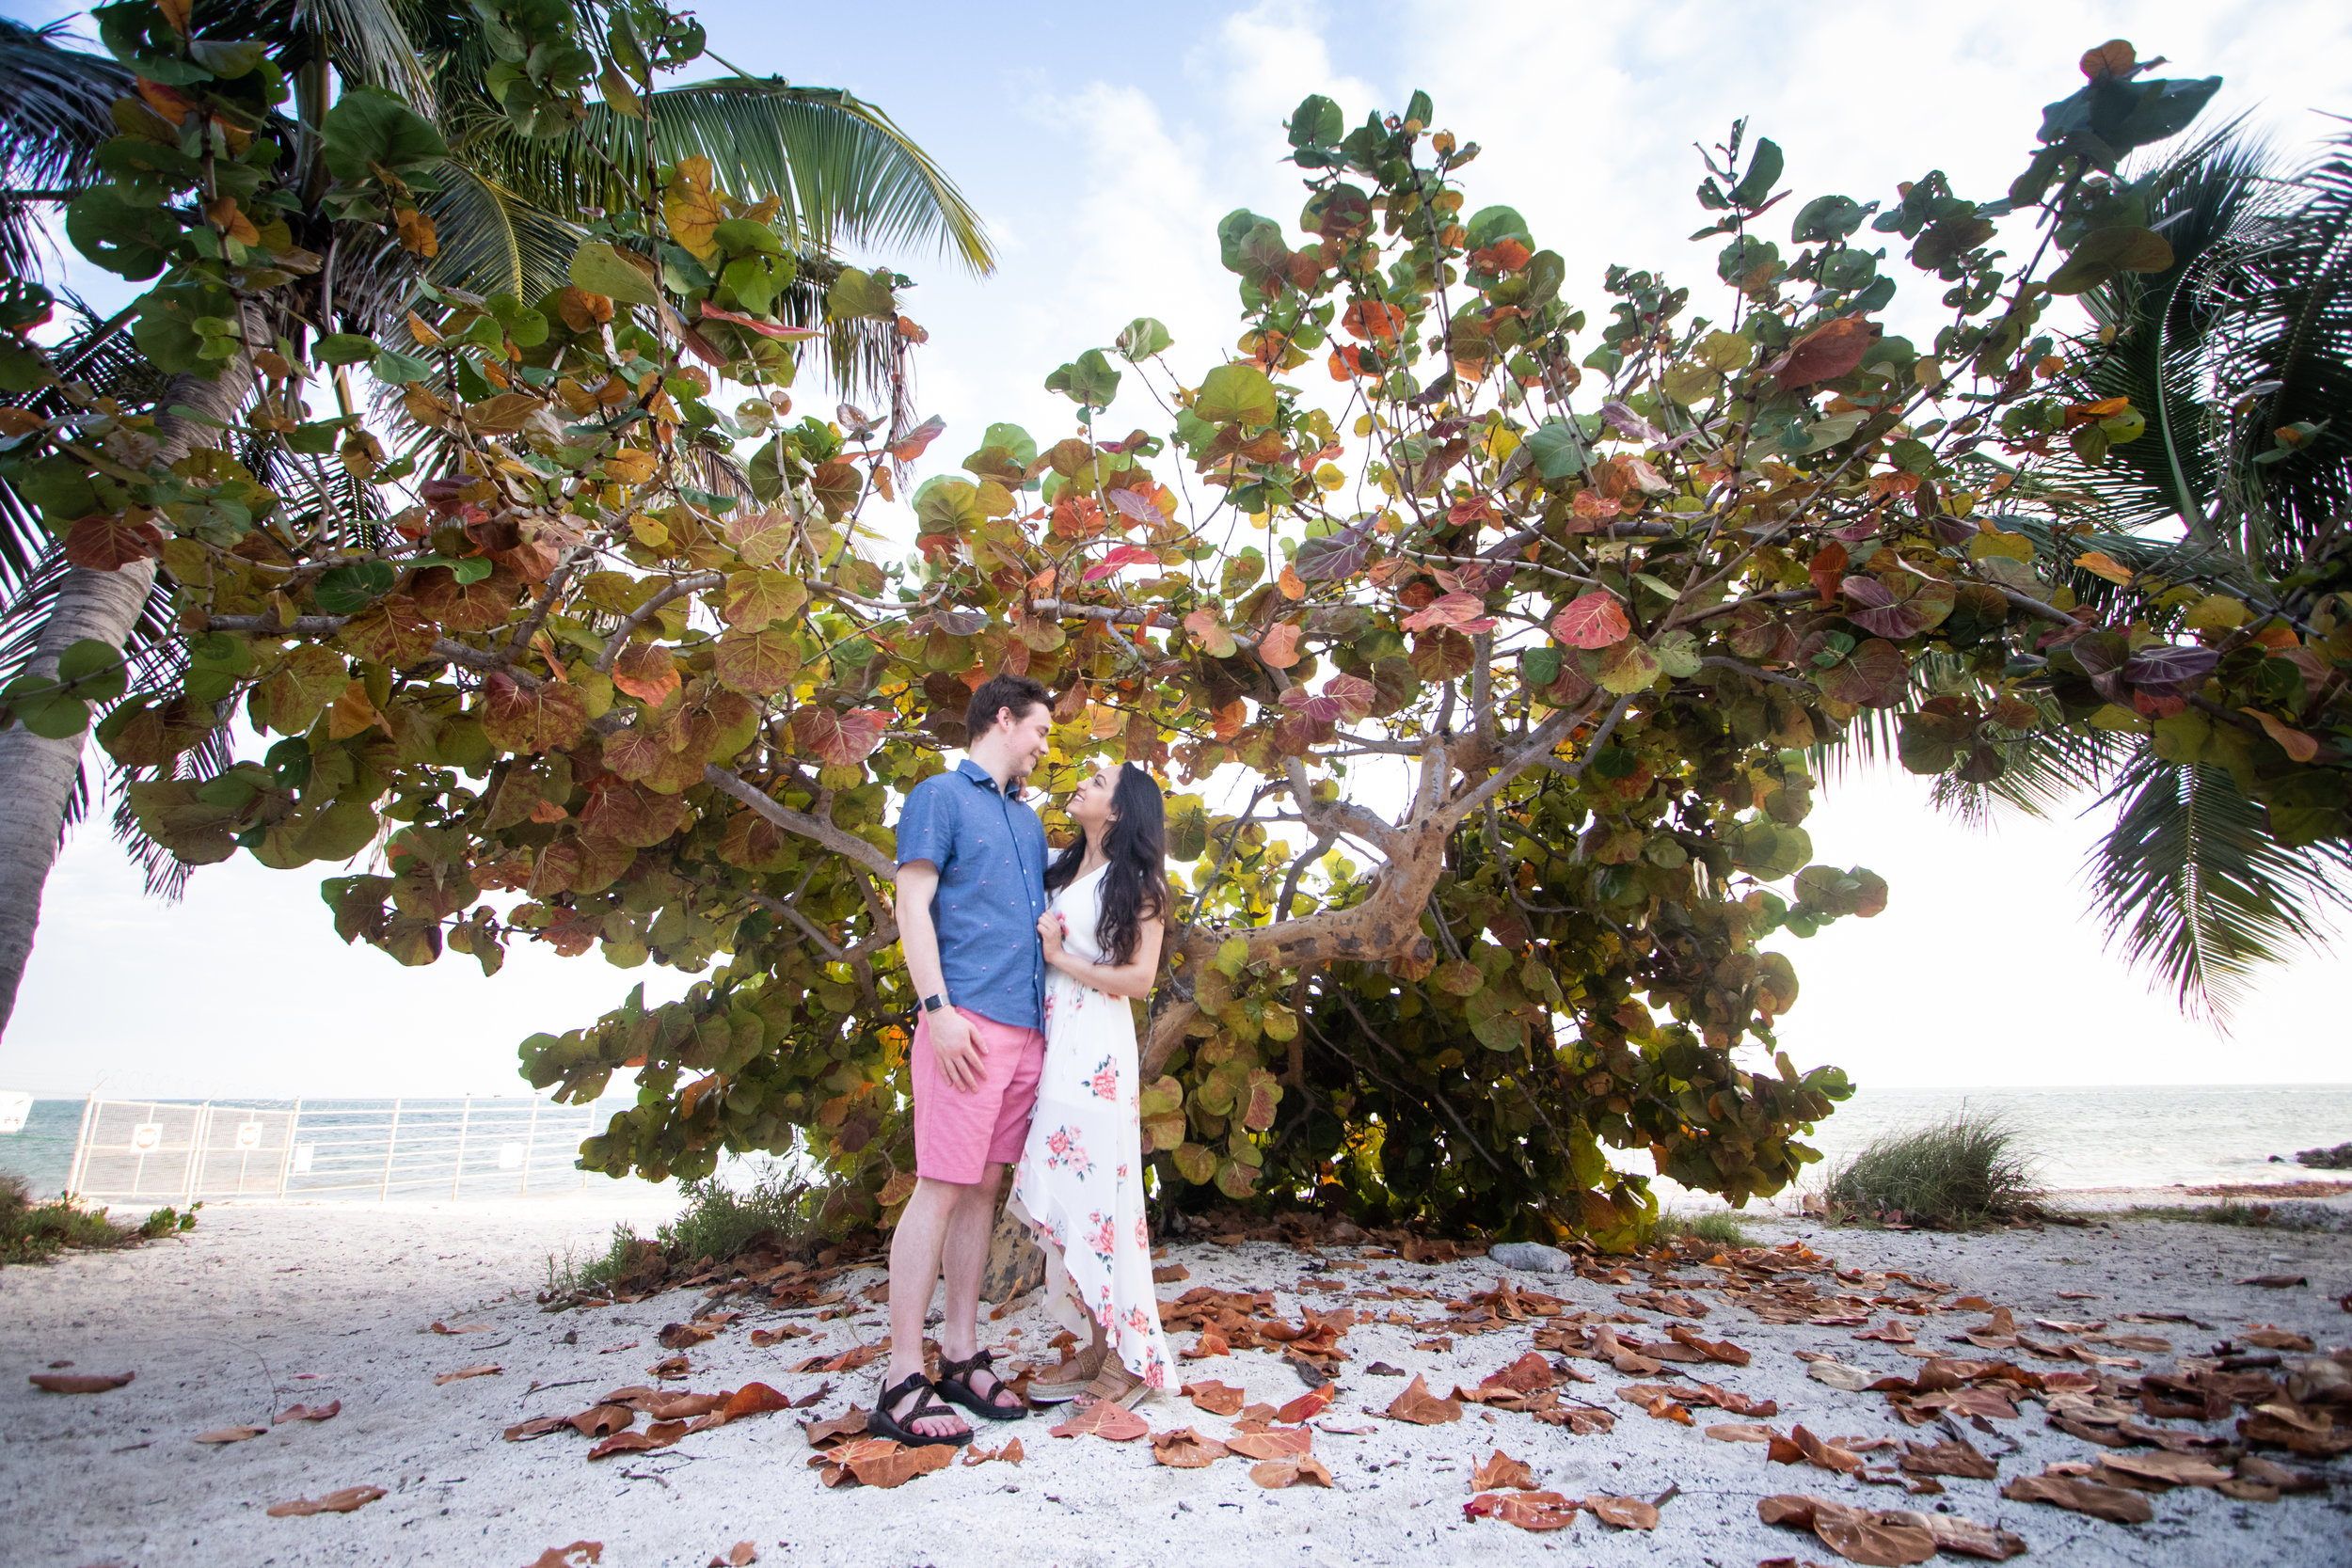 Sea Grape Bushes Make Great Backdrops for a Key West Engagement Photo SHoot.jpg